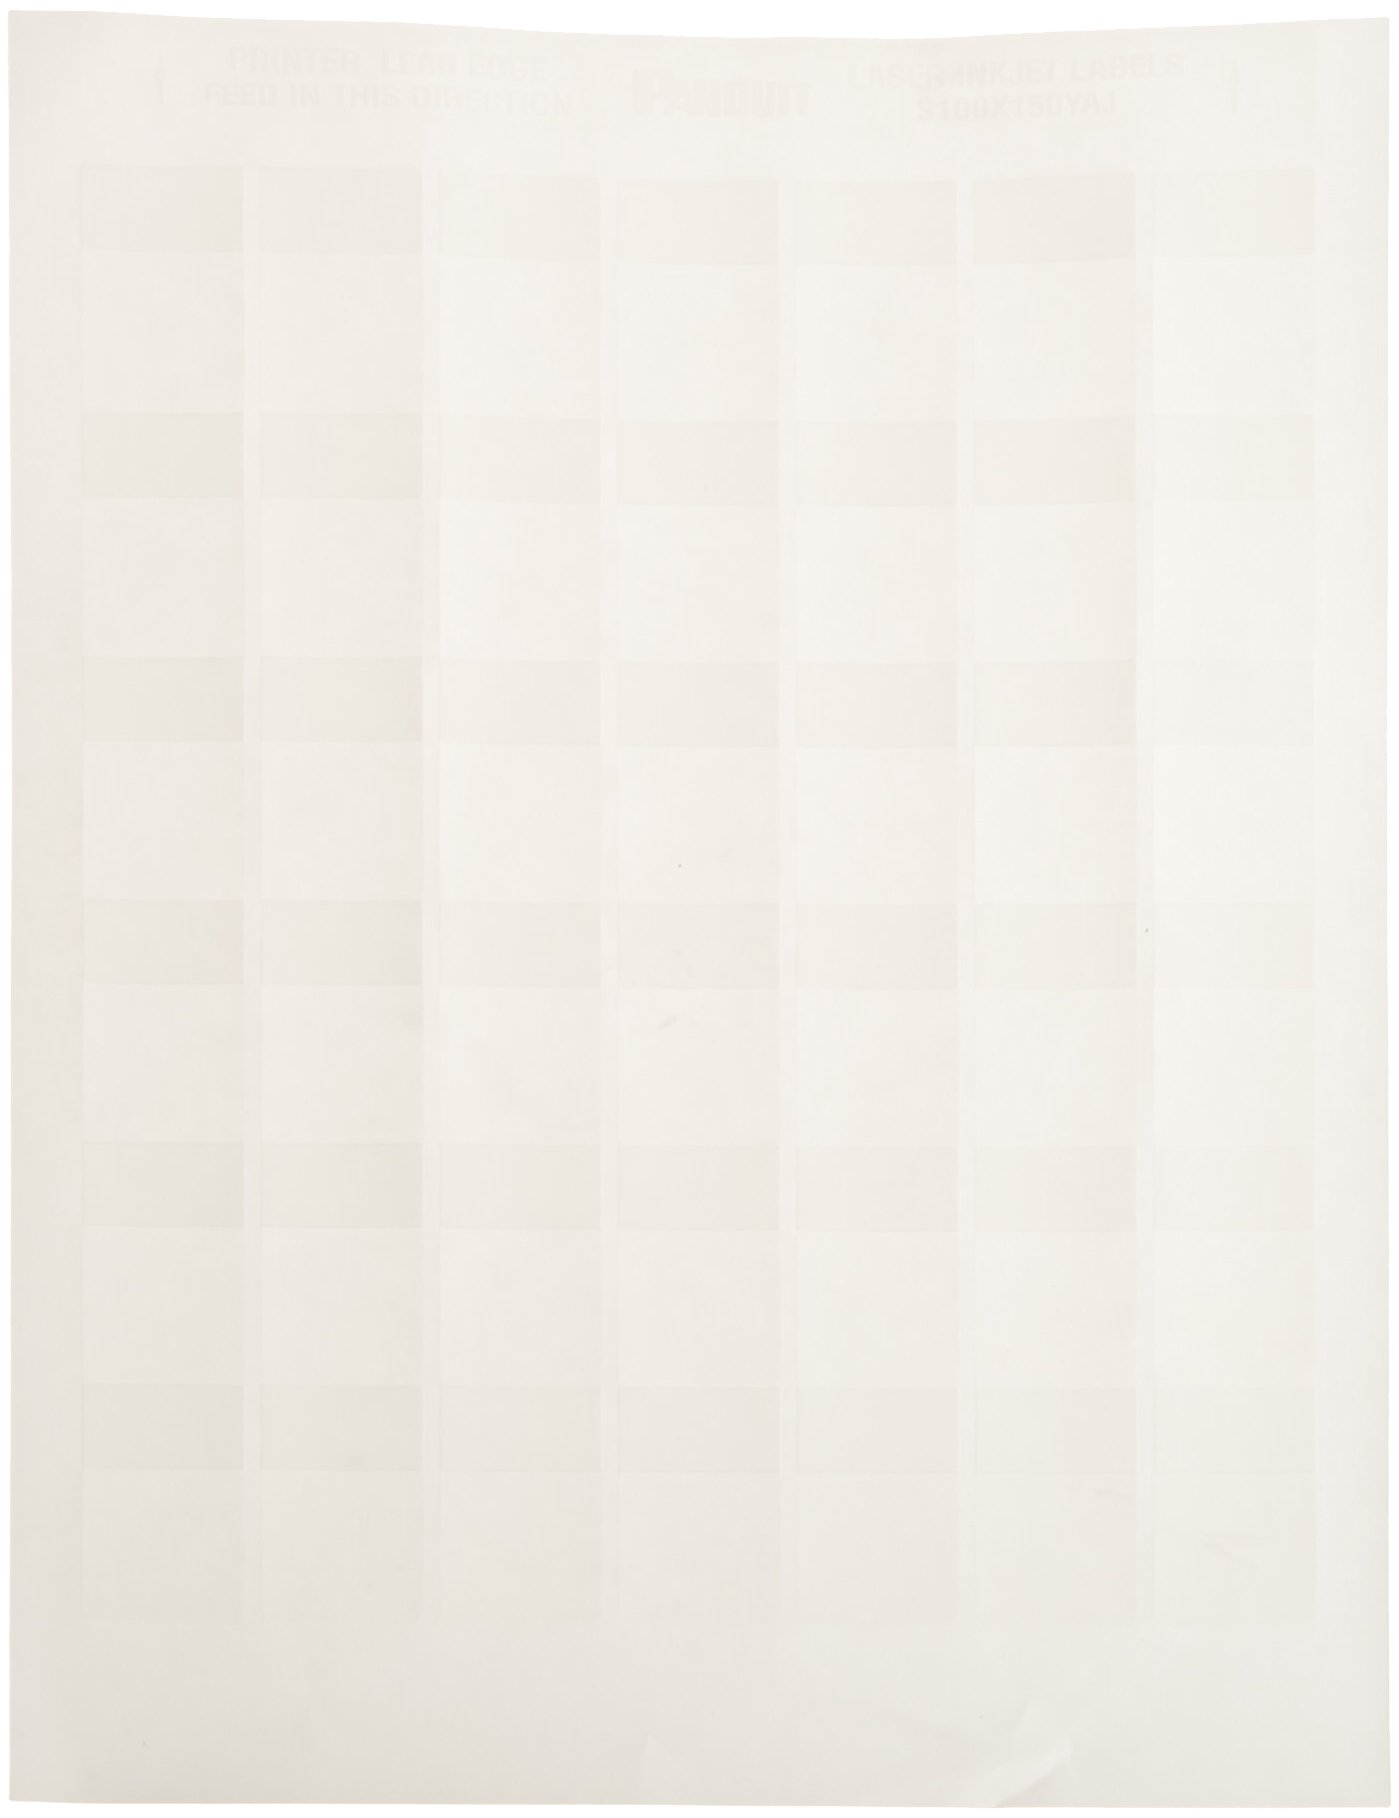 Panduit S100X150YAJ Laser/Inkjet Self-Laminated Label, Polyester, Clear/ White (2,500-Pack)